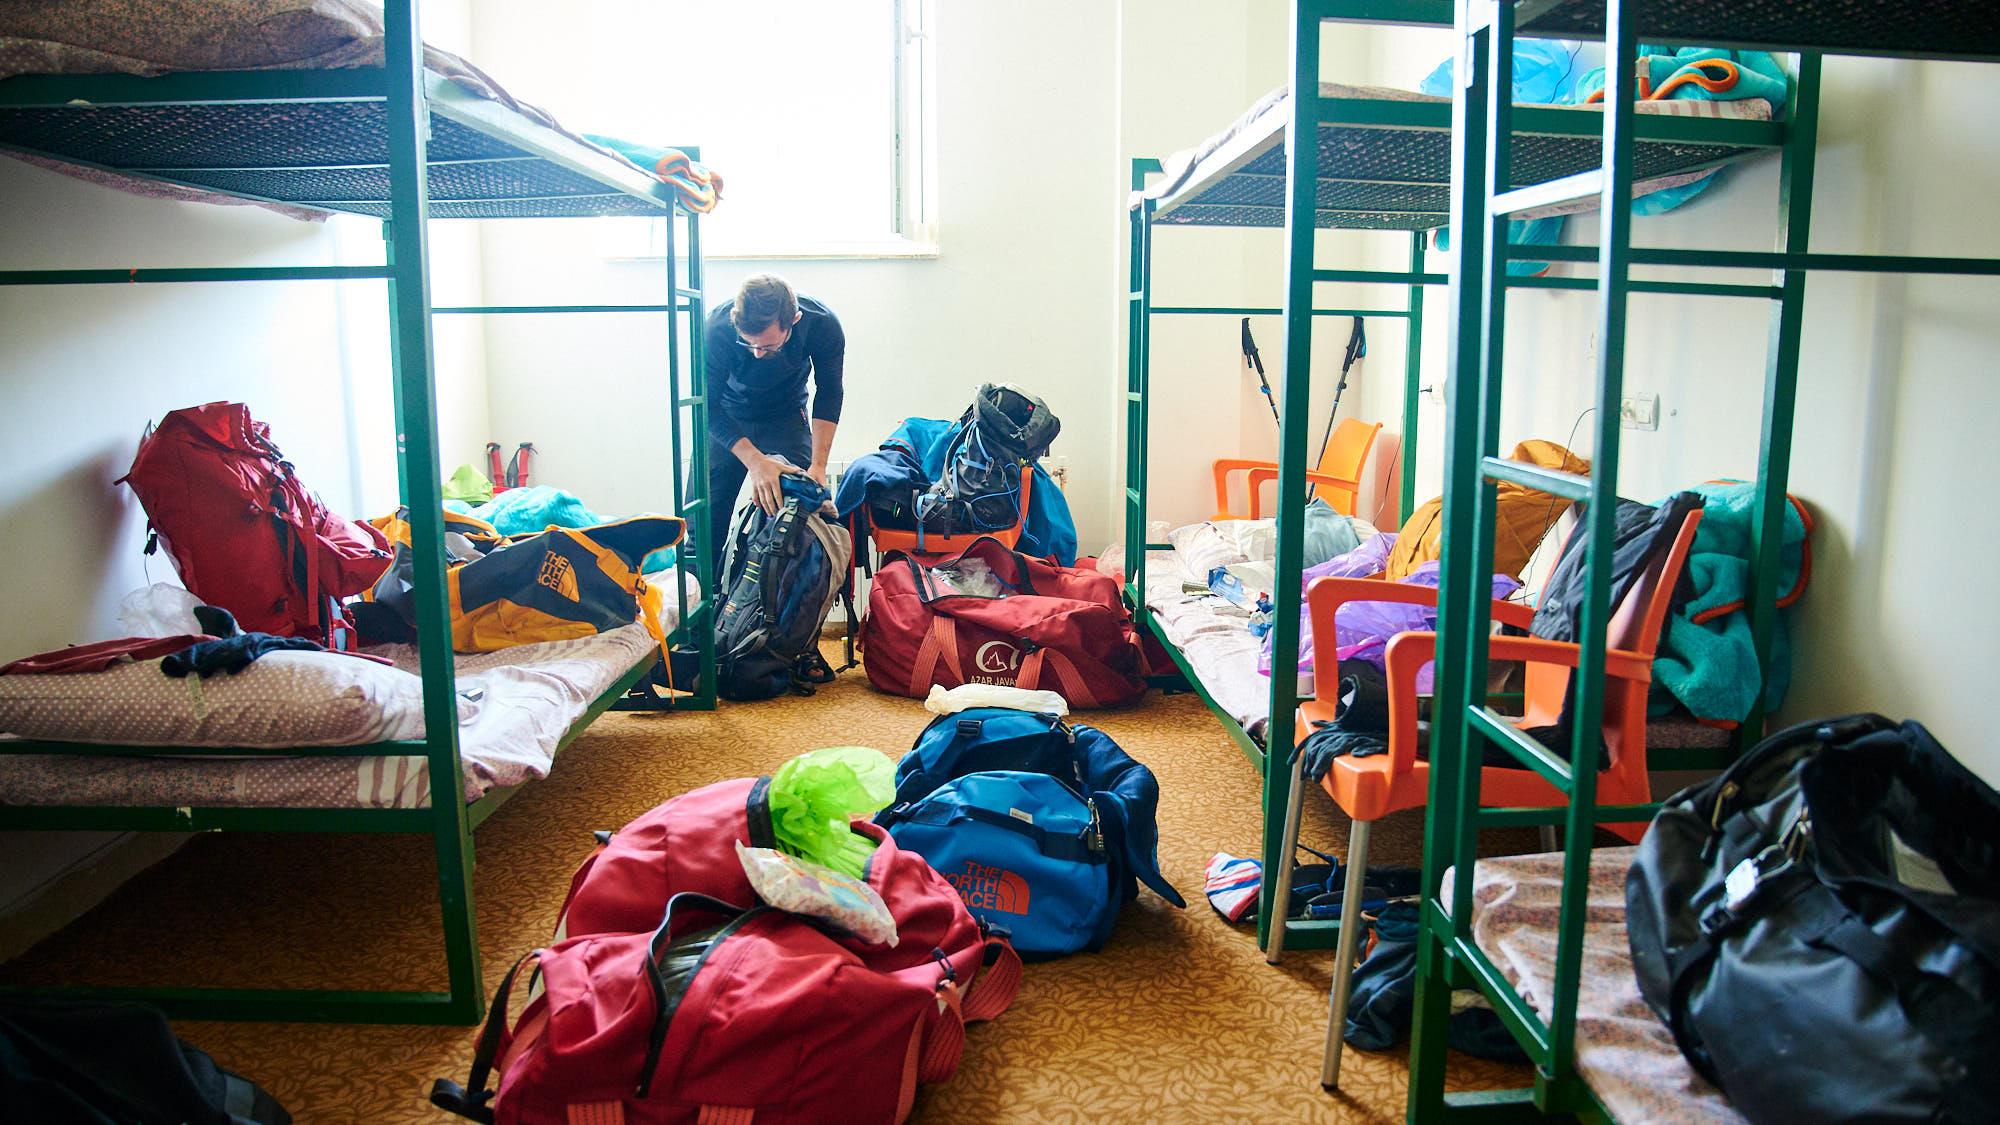 Sleeping bunks in Poulor, Iran